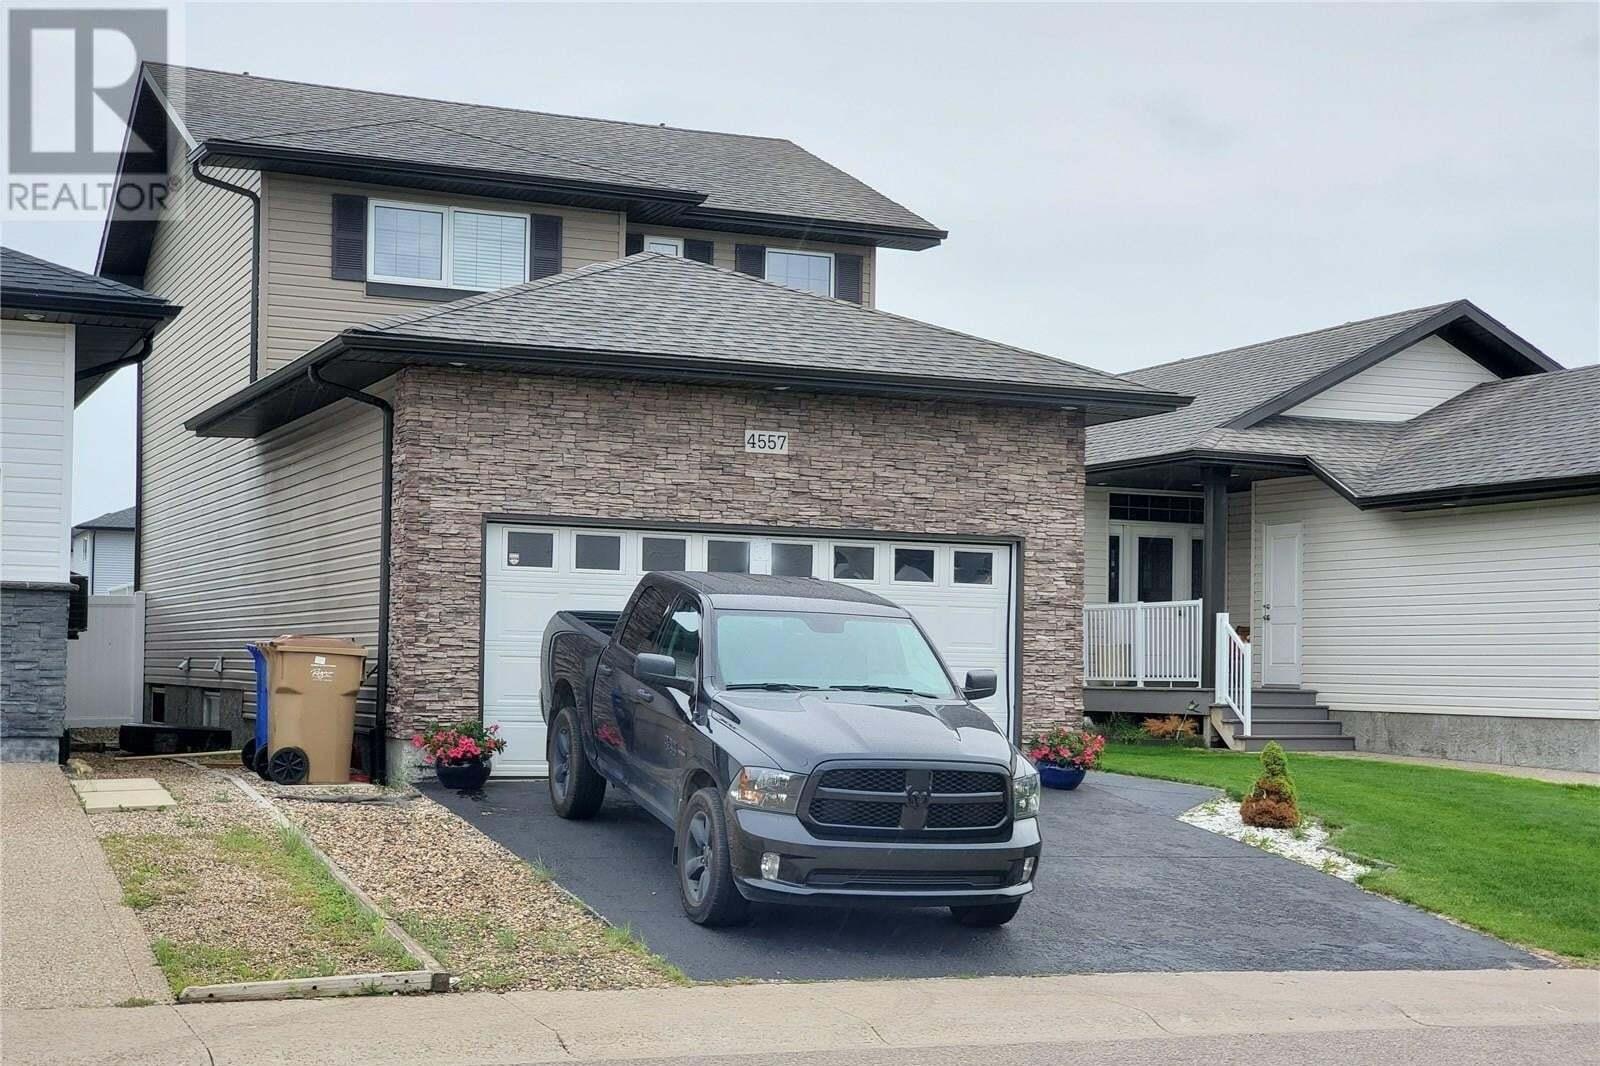 House for sale at 4557 Padwick Rd Regina Saskatchewan - MLS: SK815435